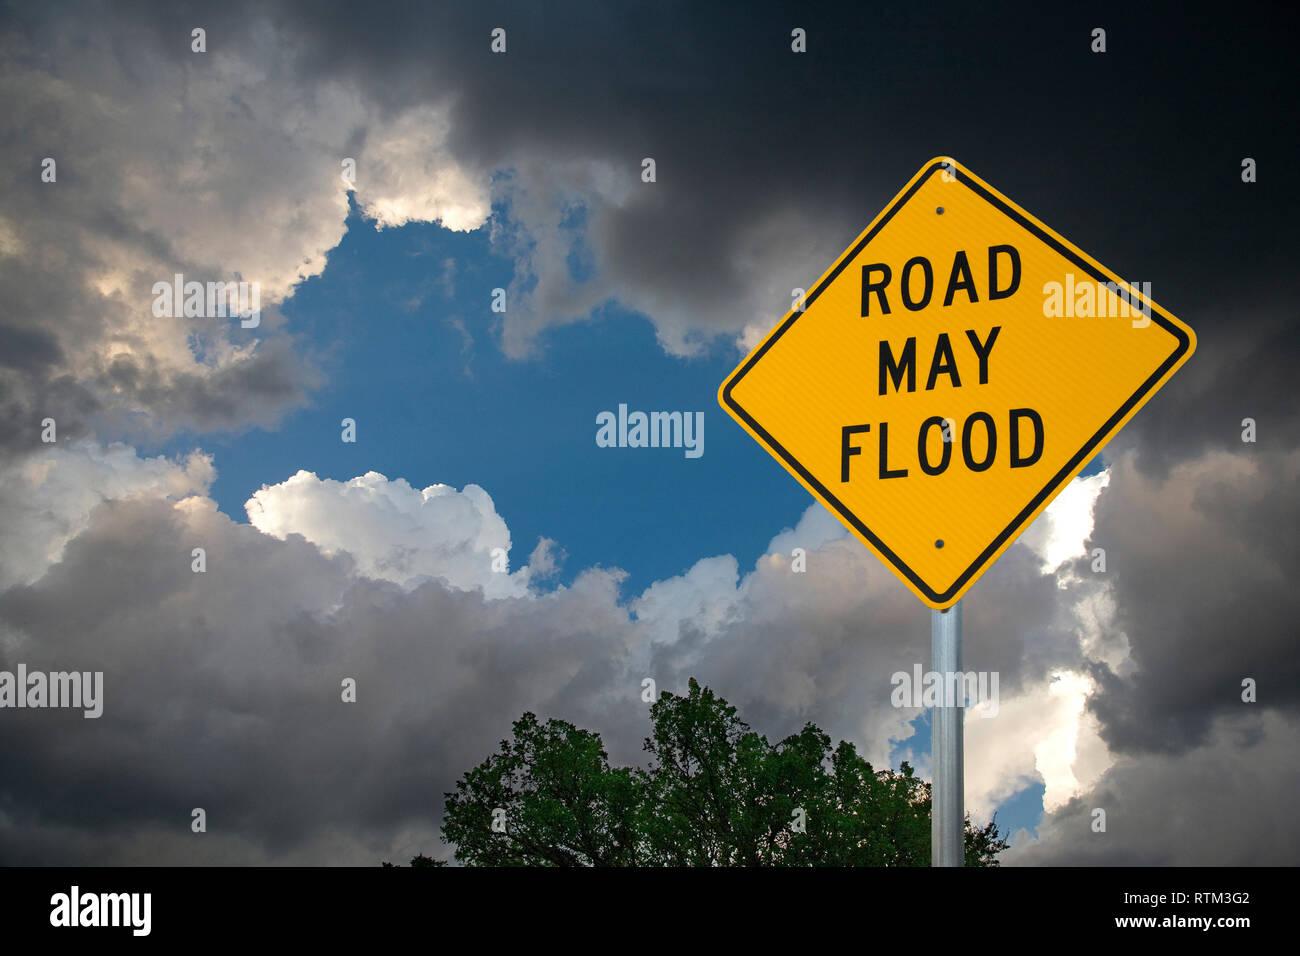 ROAD MAY FLOOD - Stock Image